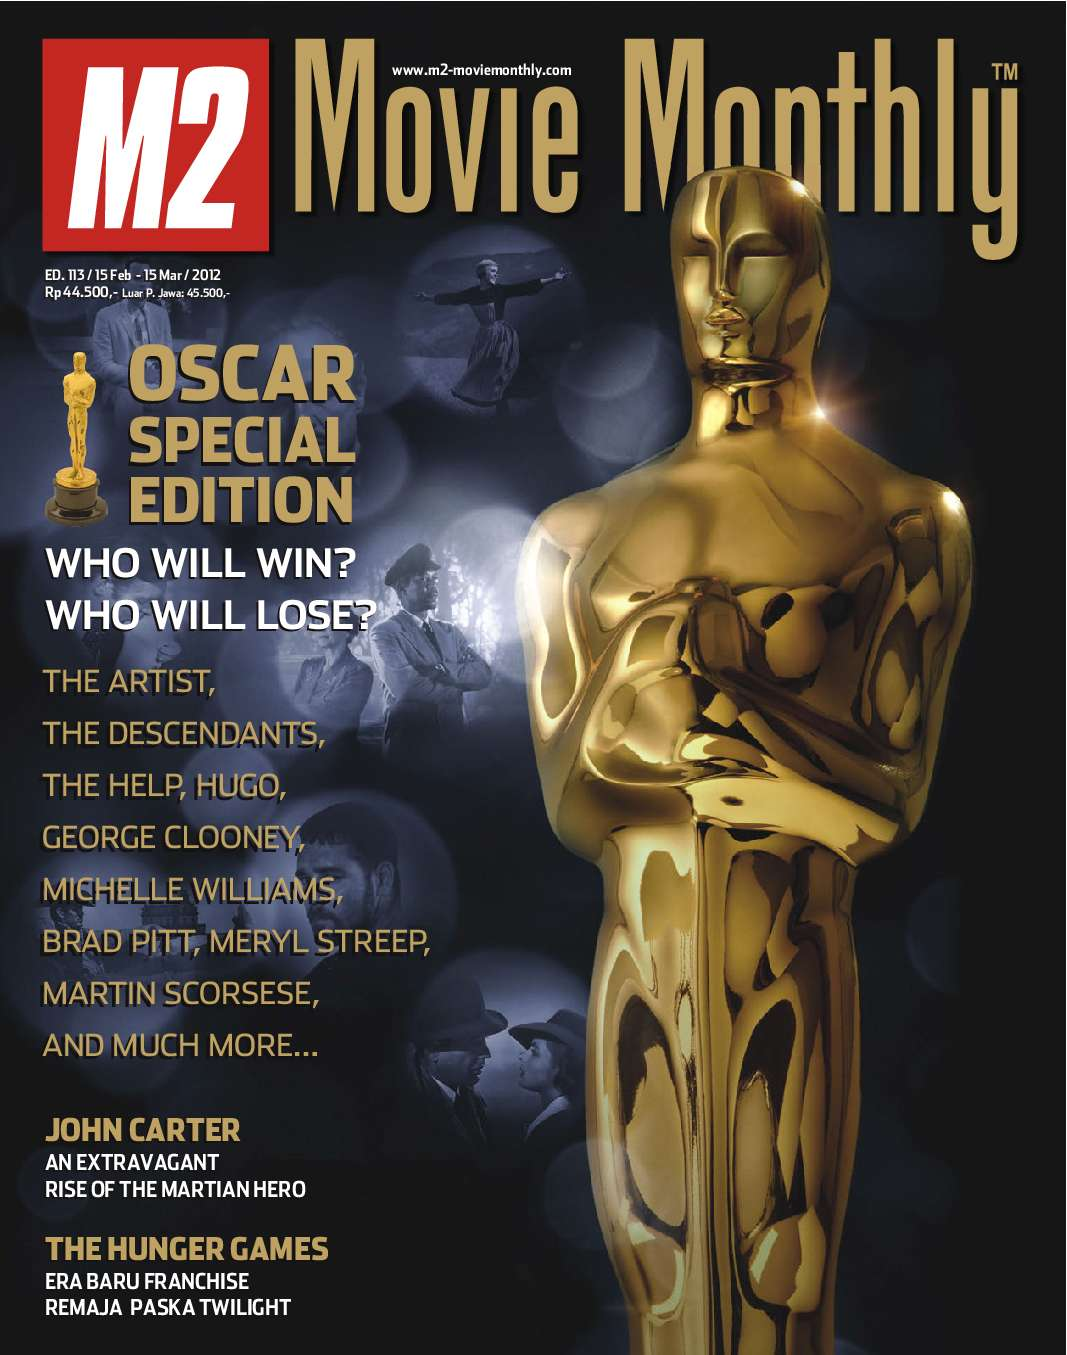 Jual Majalah M2 Movie Monthly Maret 2012 - Gramedia